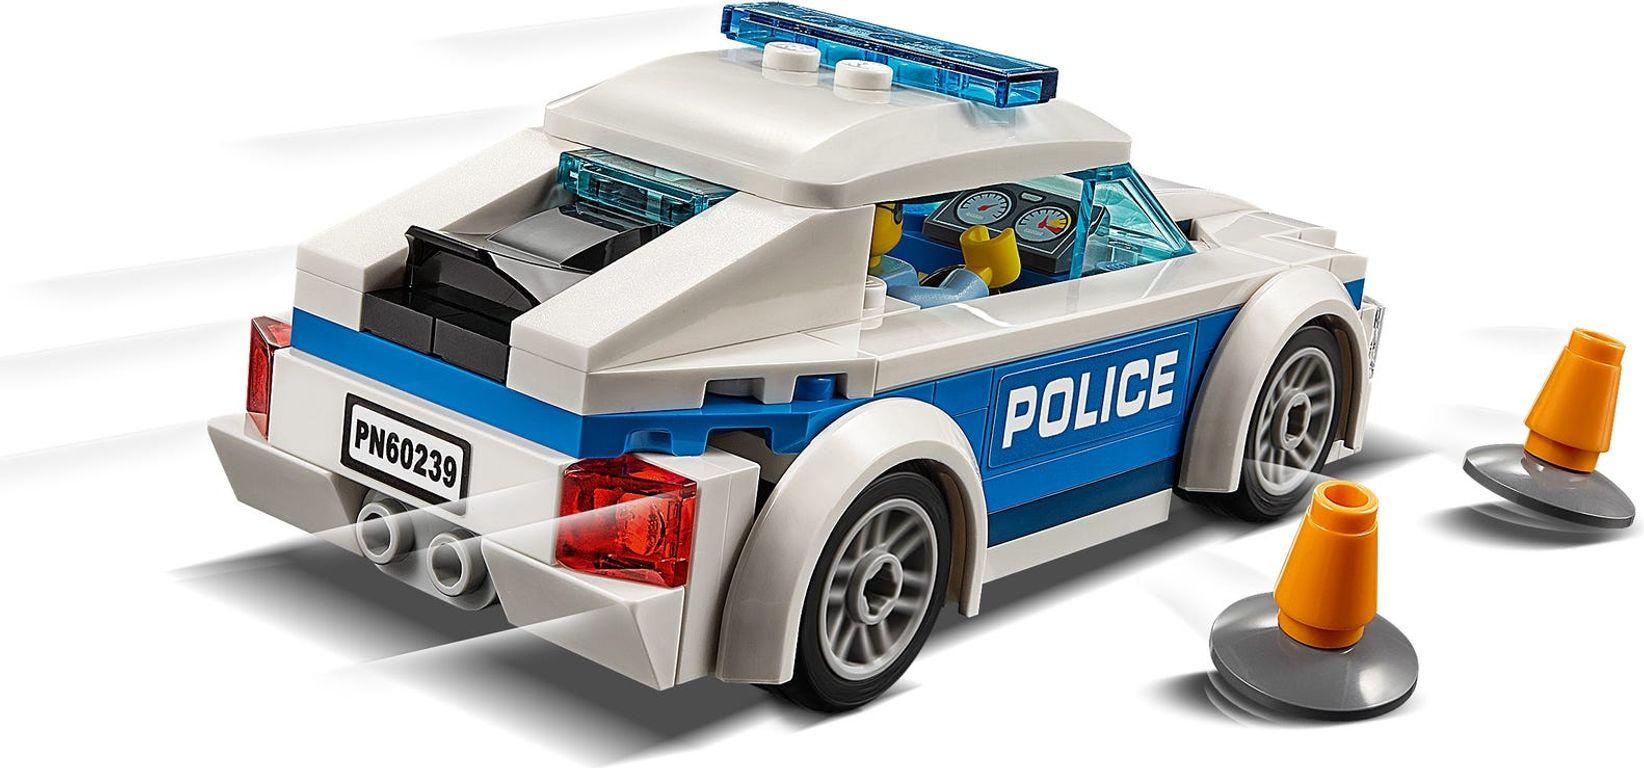 Patrol Car back side